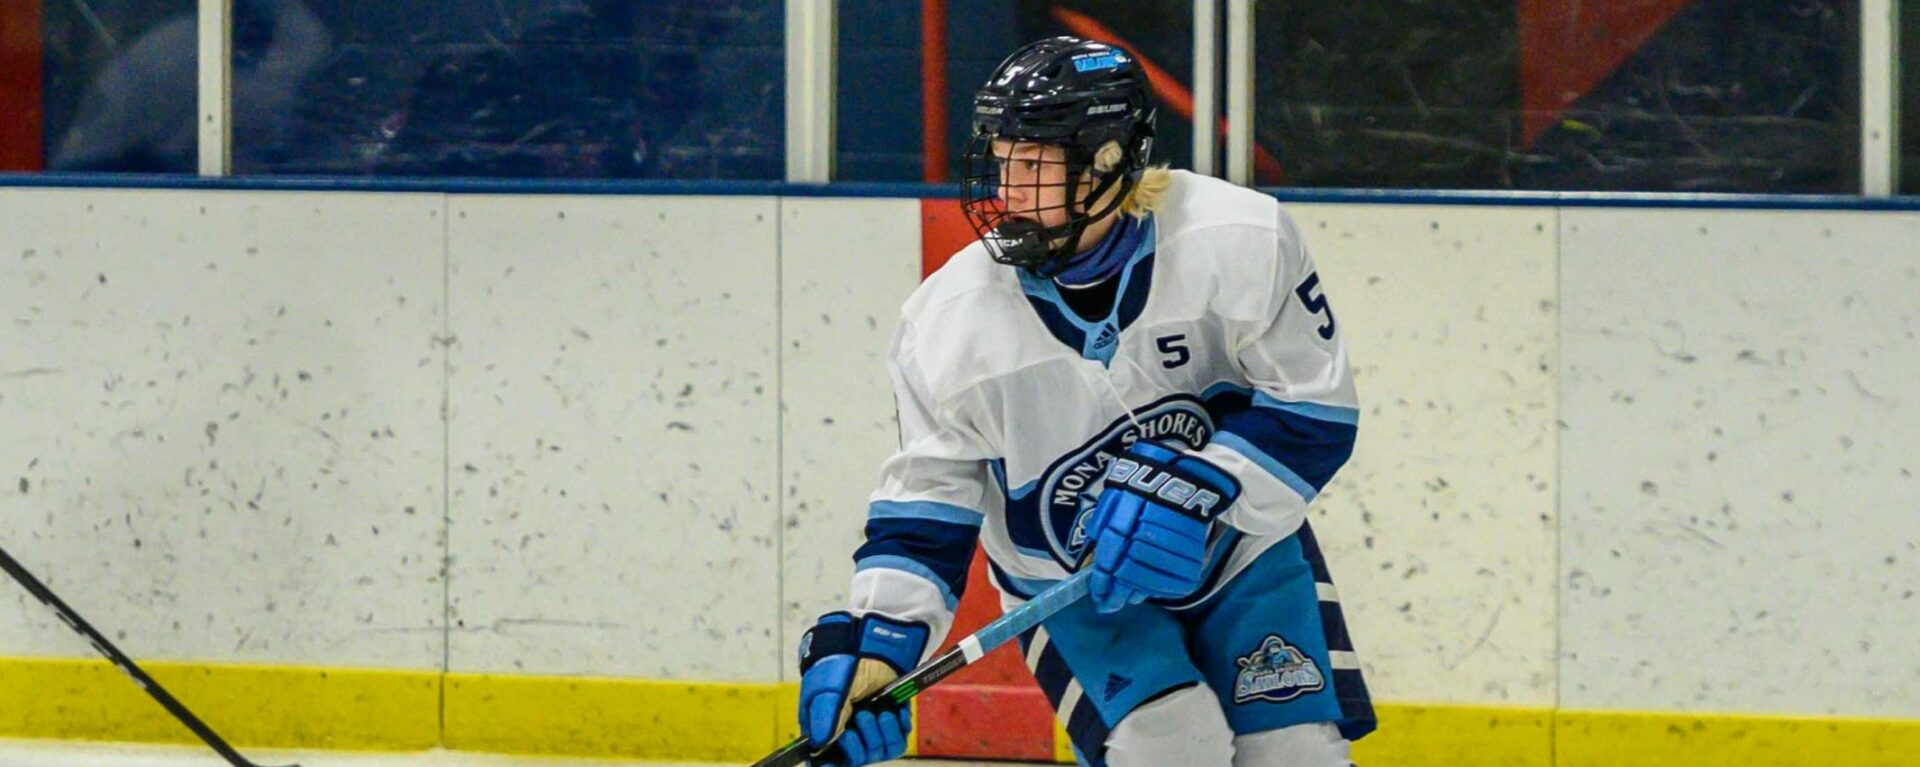 Mona Shores hockey drops heart breaker in division 2 regional finals